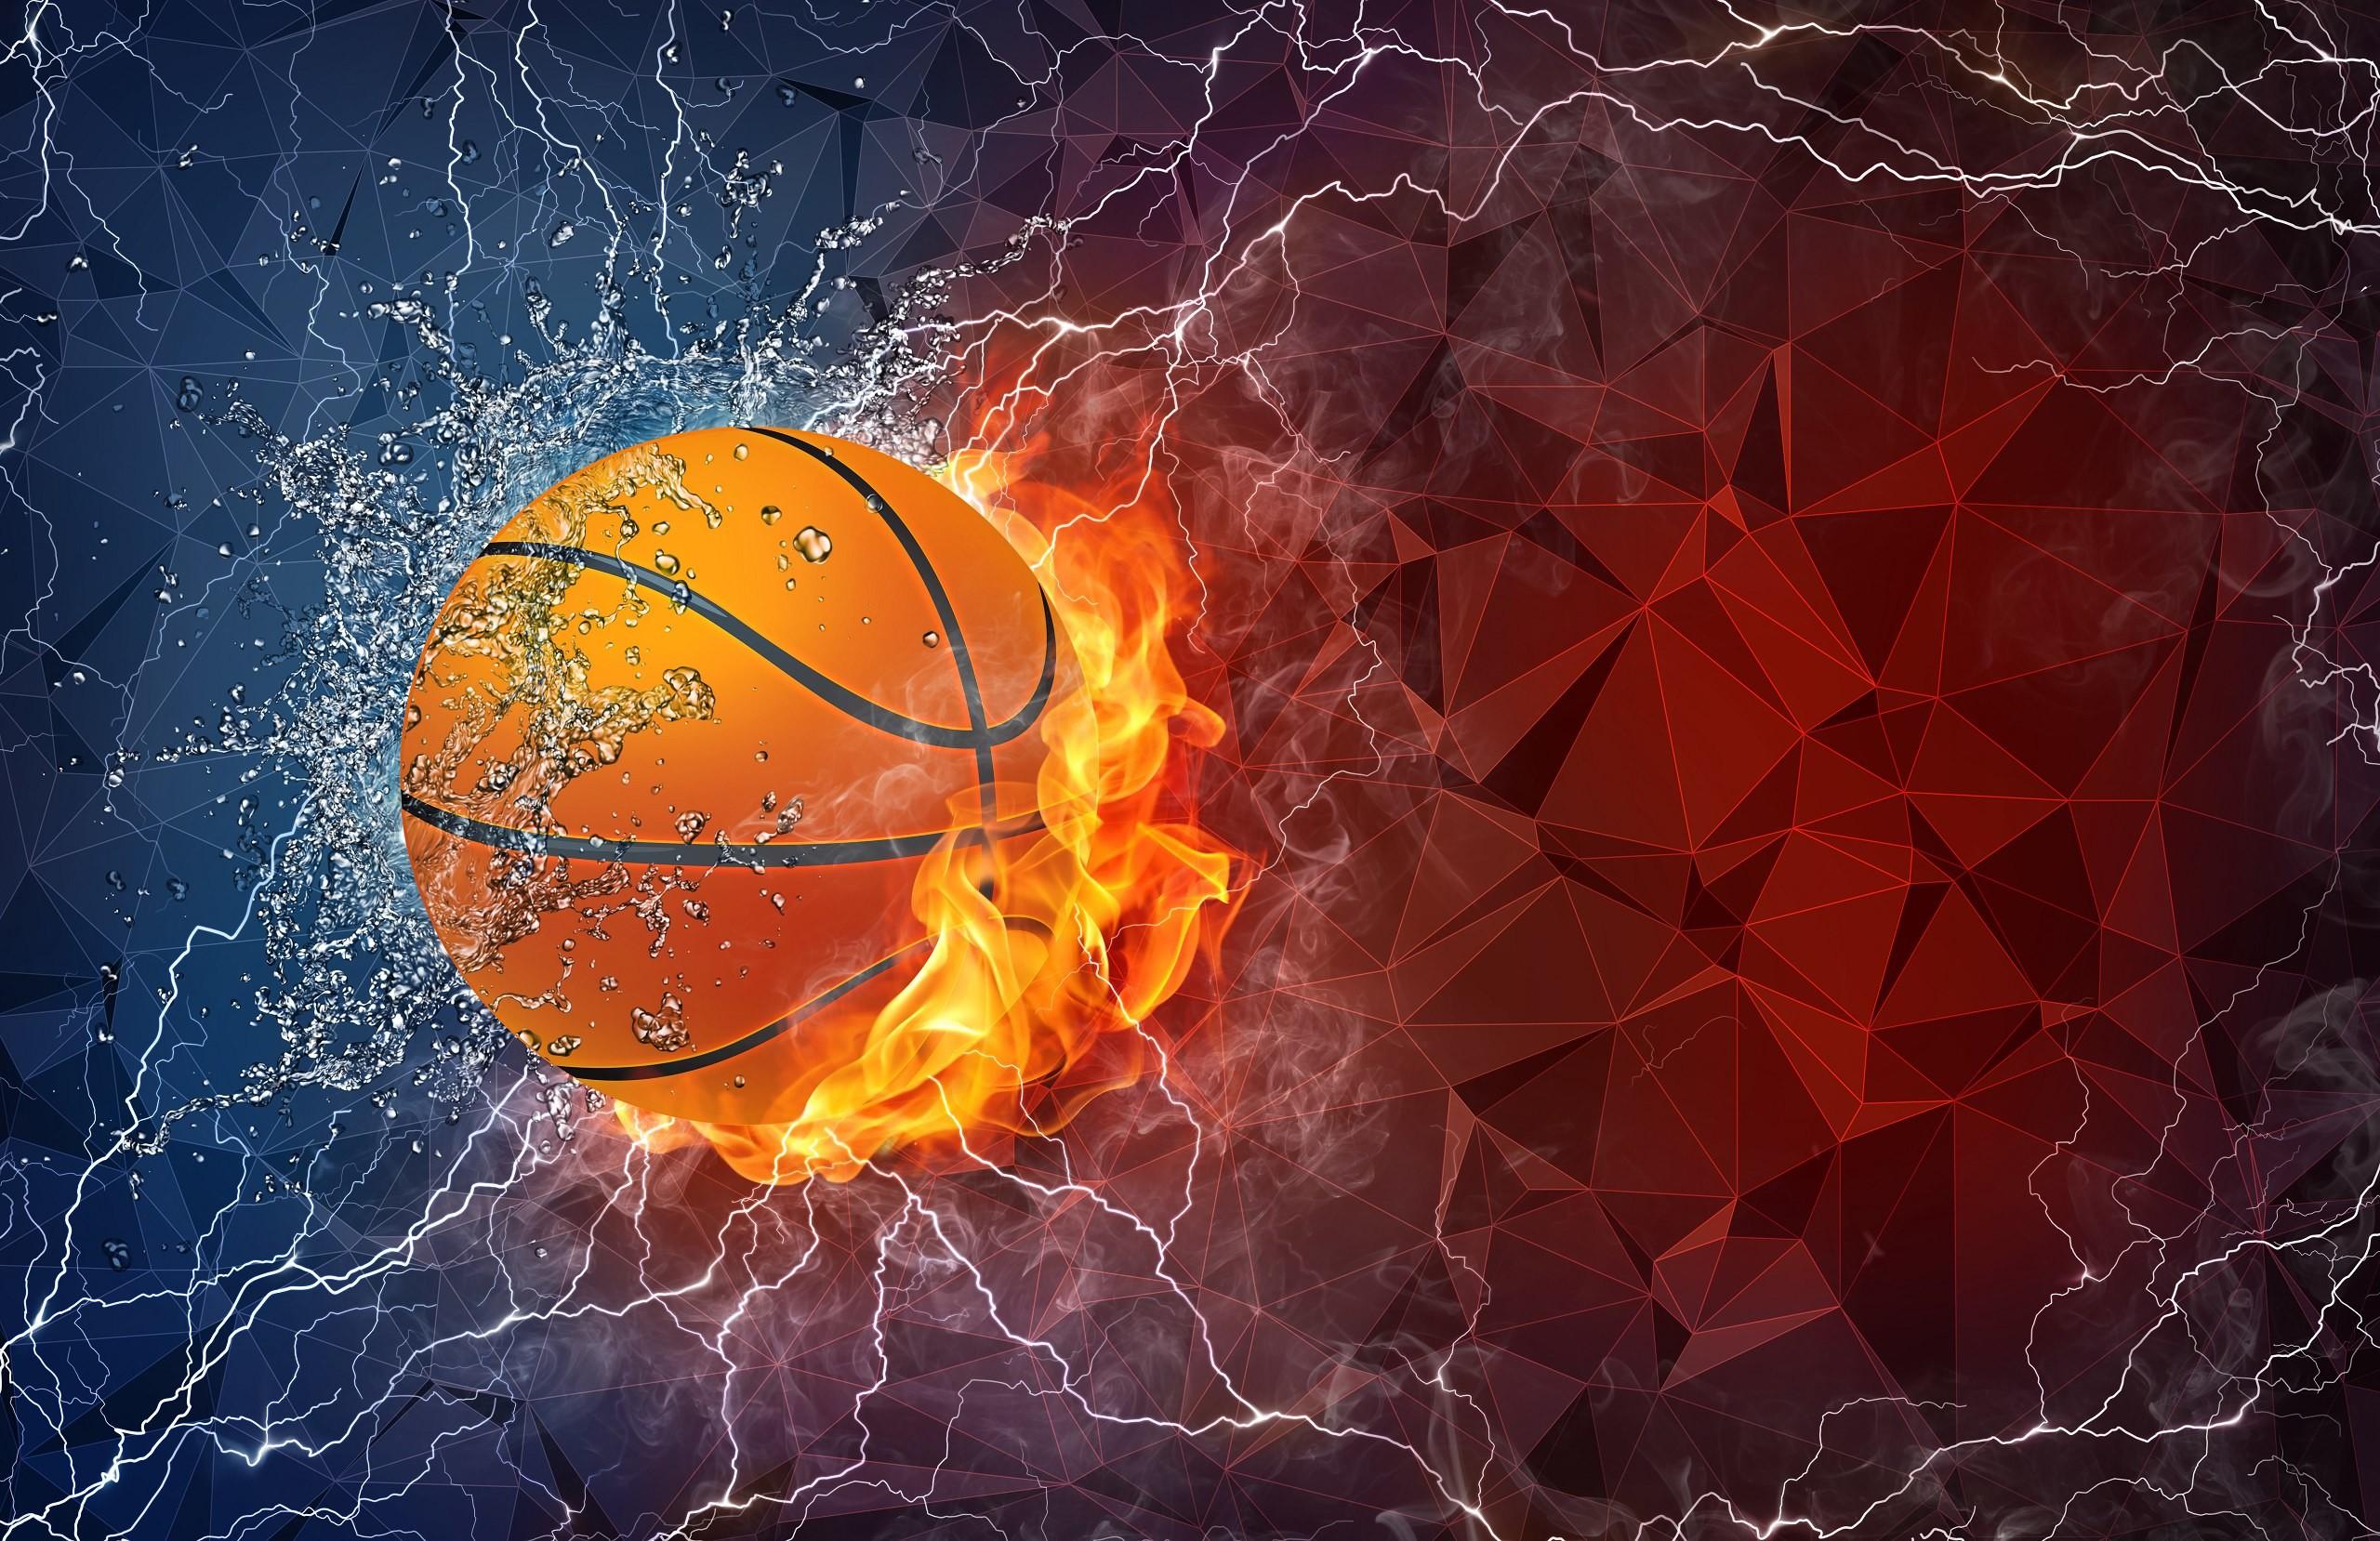 RJJ7PtL QQ8SrBF Basketball ball in fire and water …